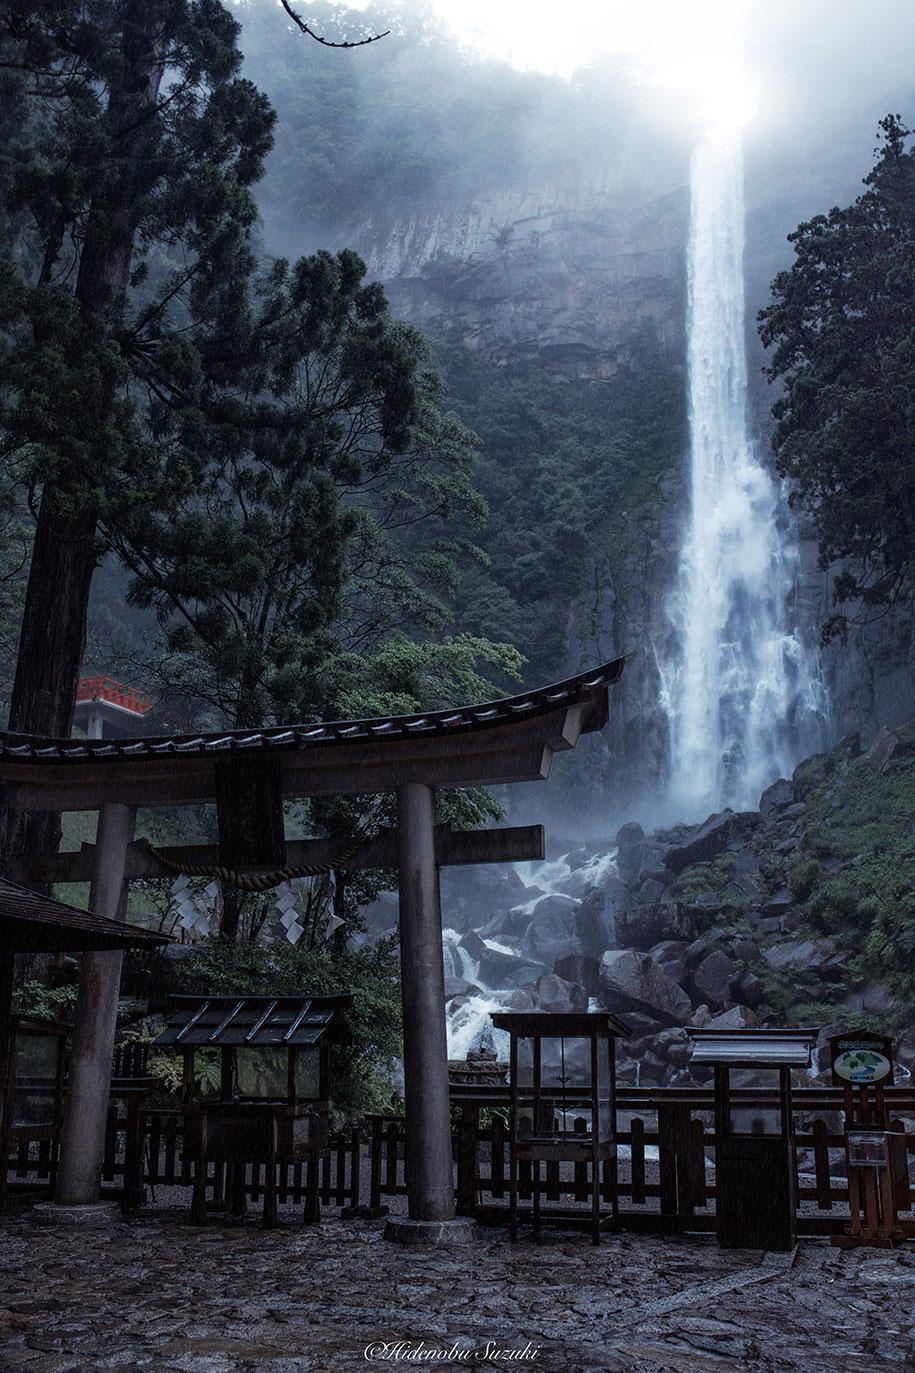 japan-rainy-season-photography-hidenobu-suzuki-2